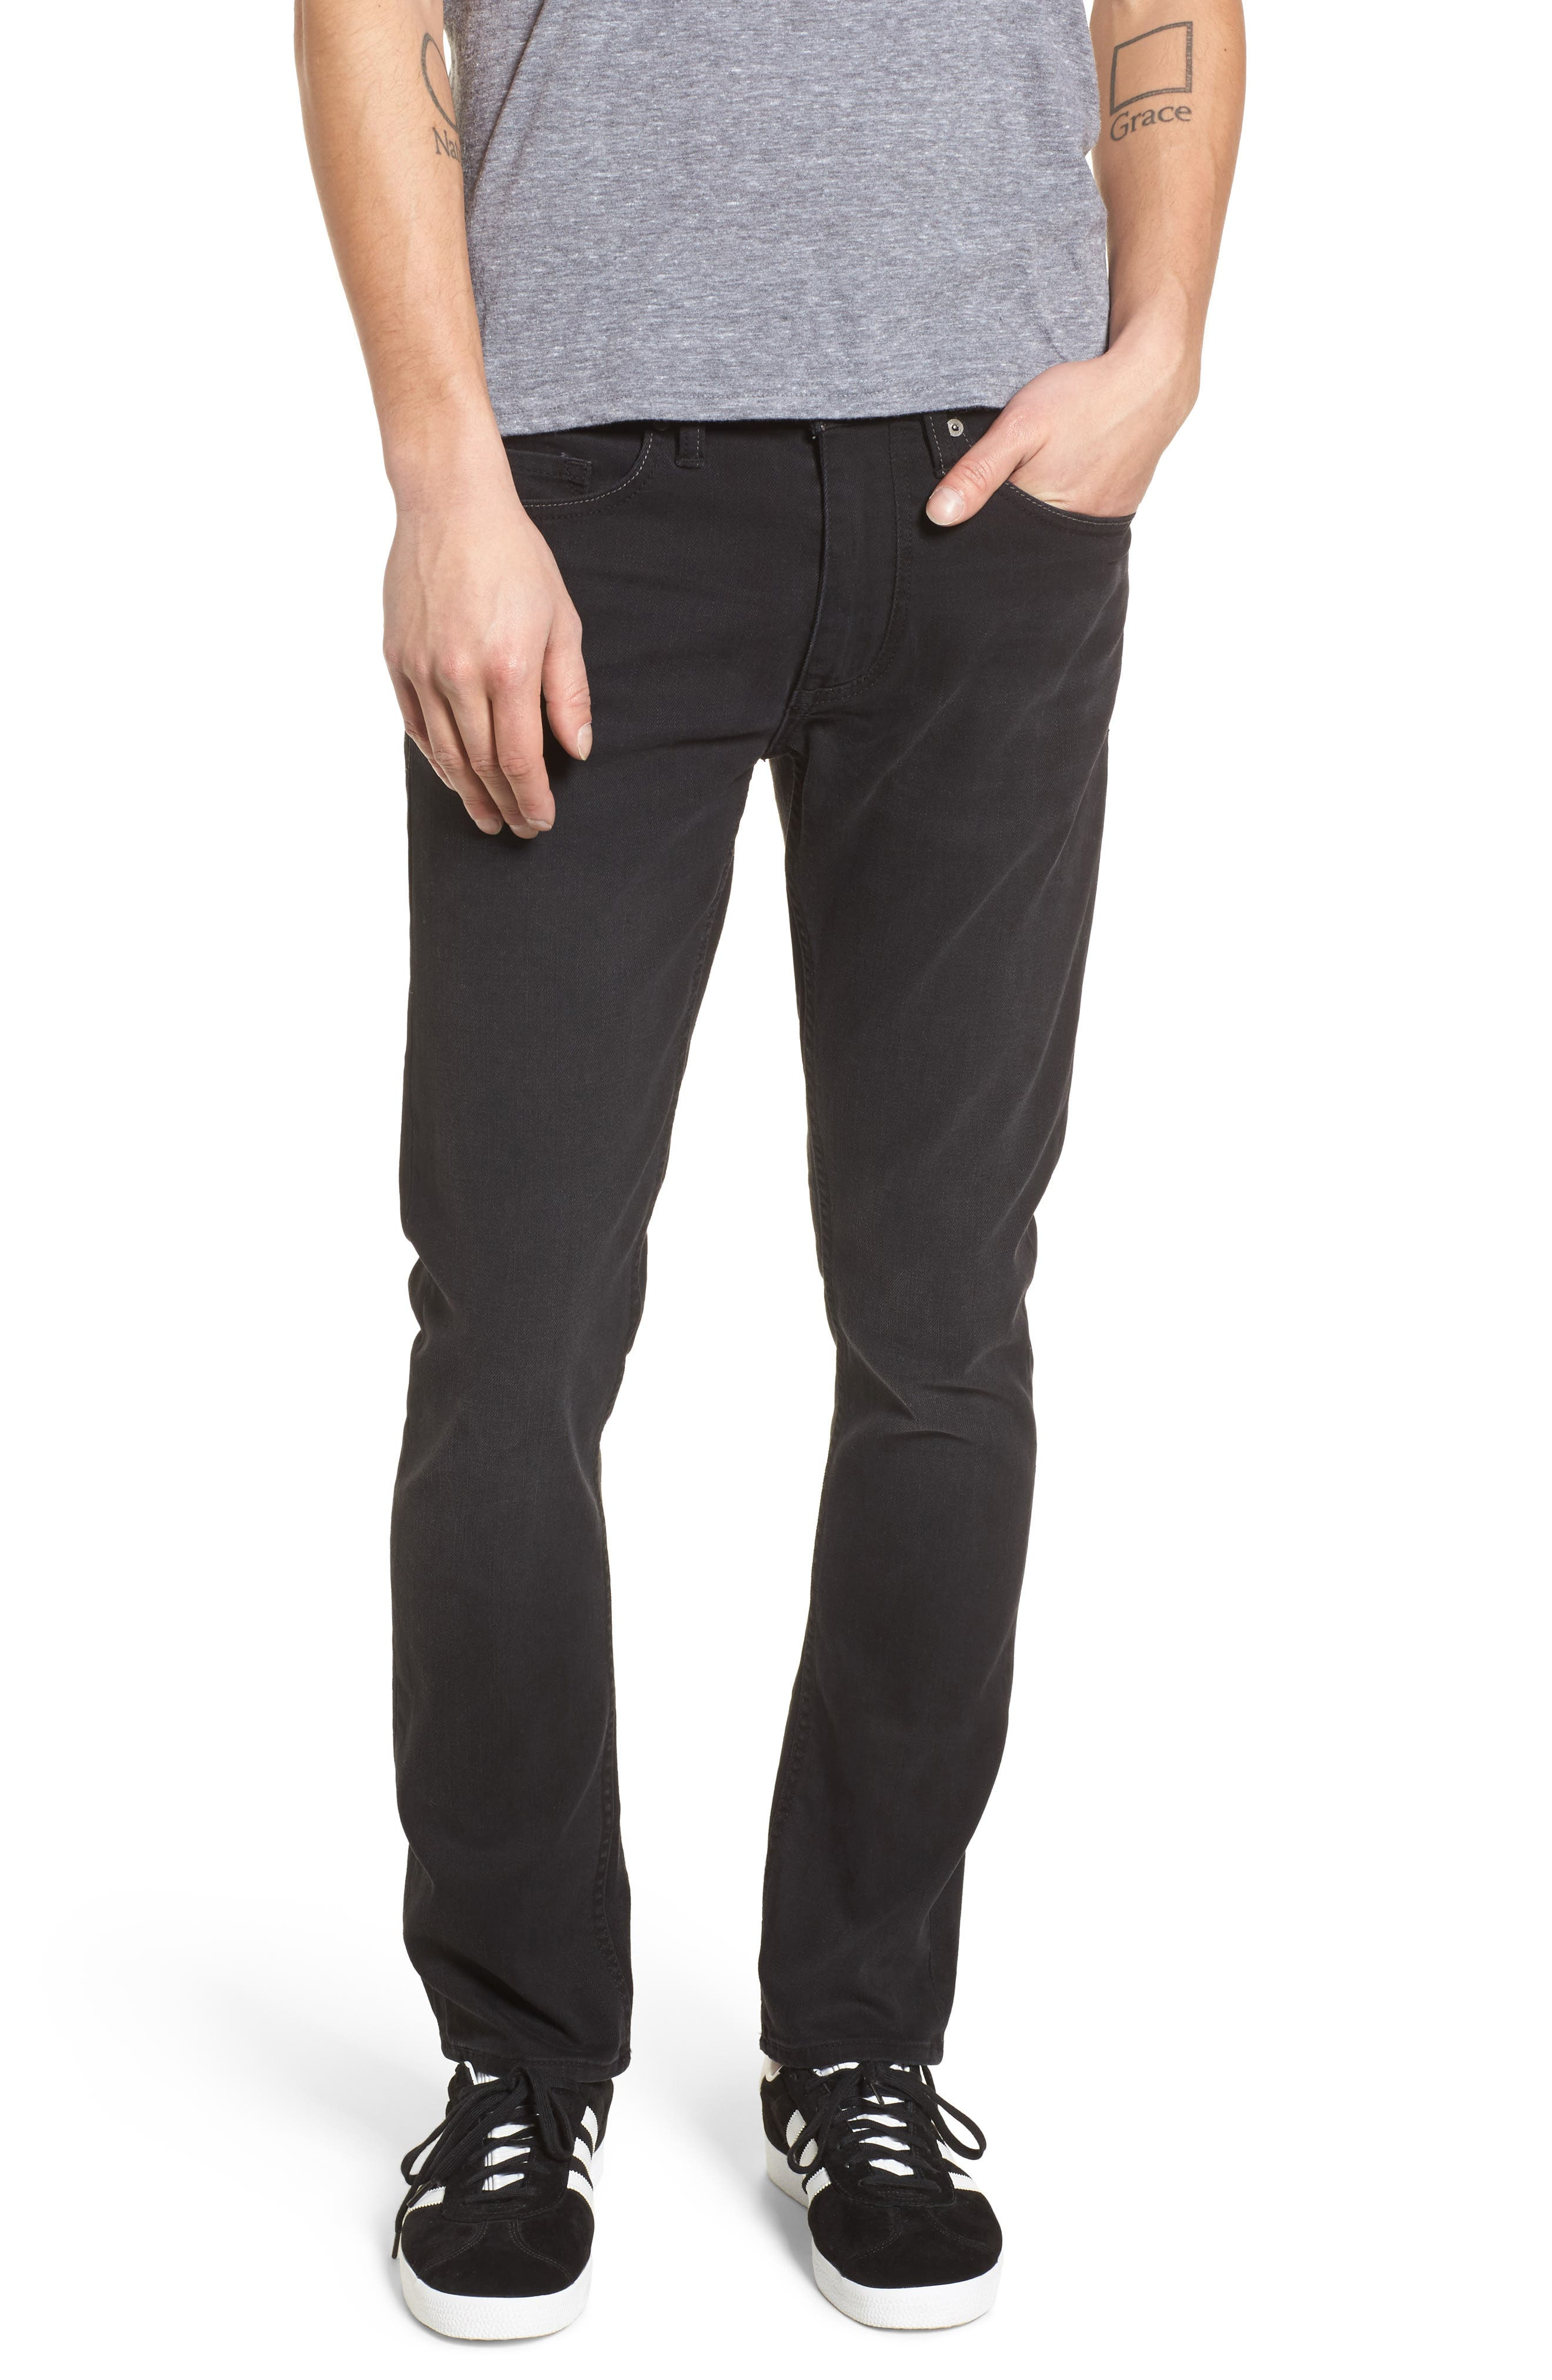 BLANKNYC Wooster Slim Fit Jeans (Stick 'n' Poke)